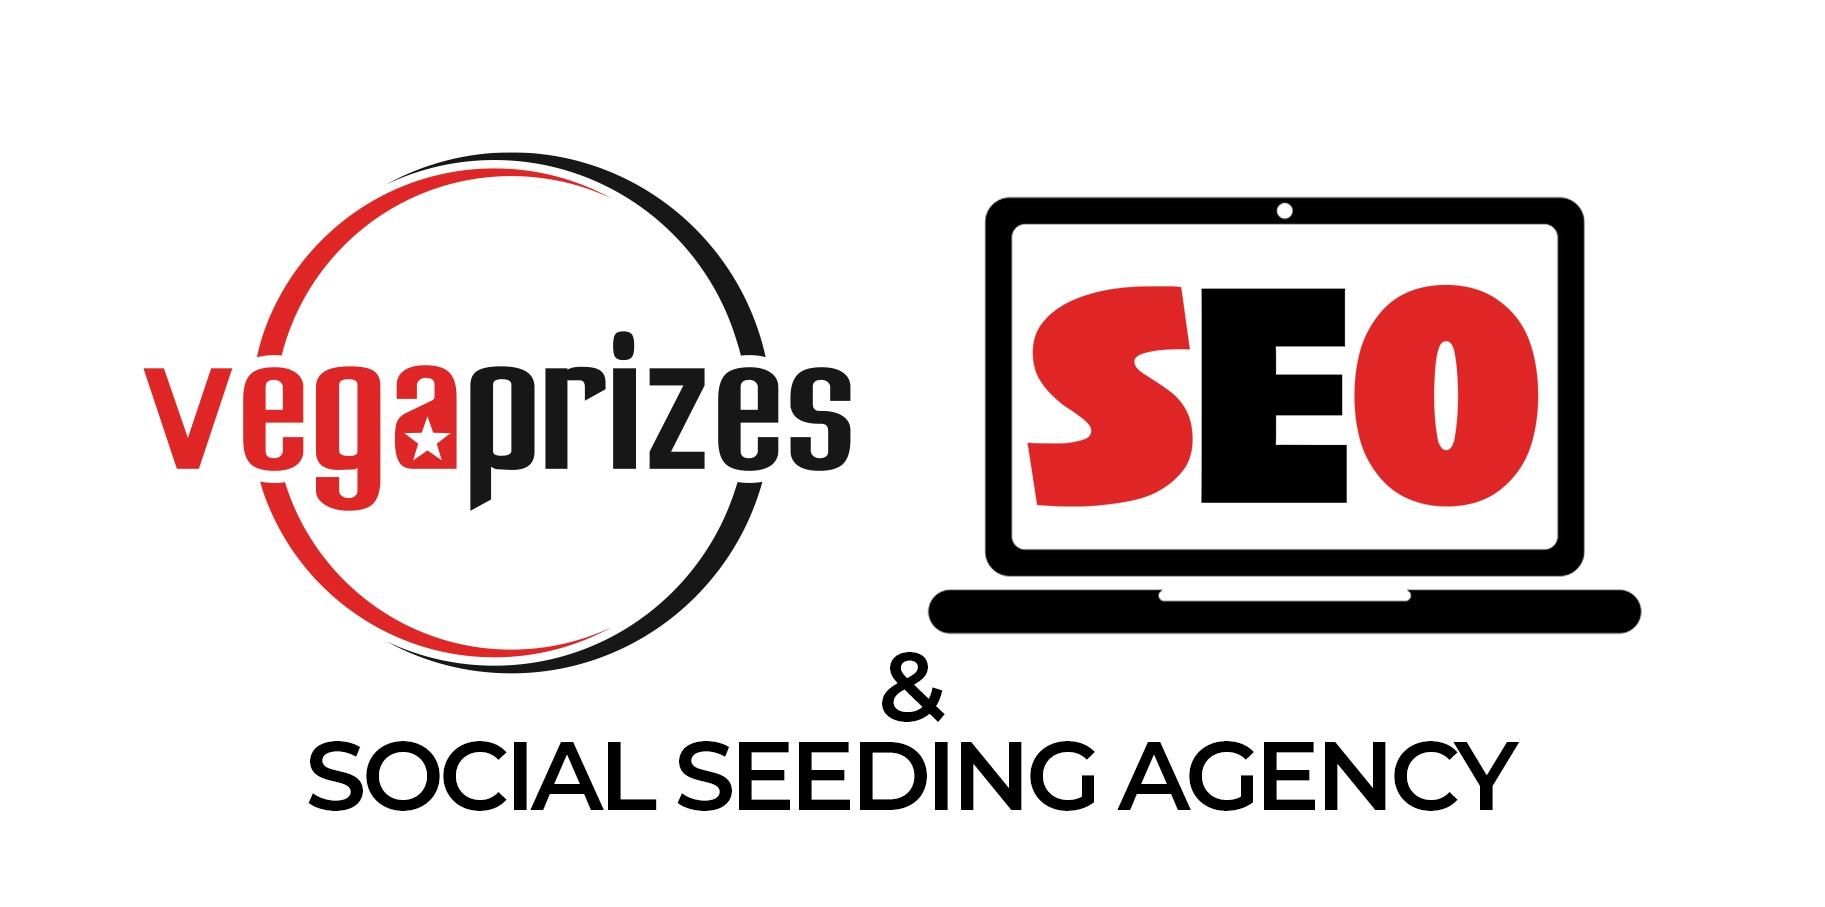 SEO & Social Seeding Company